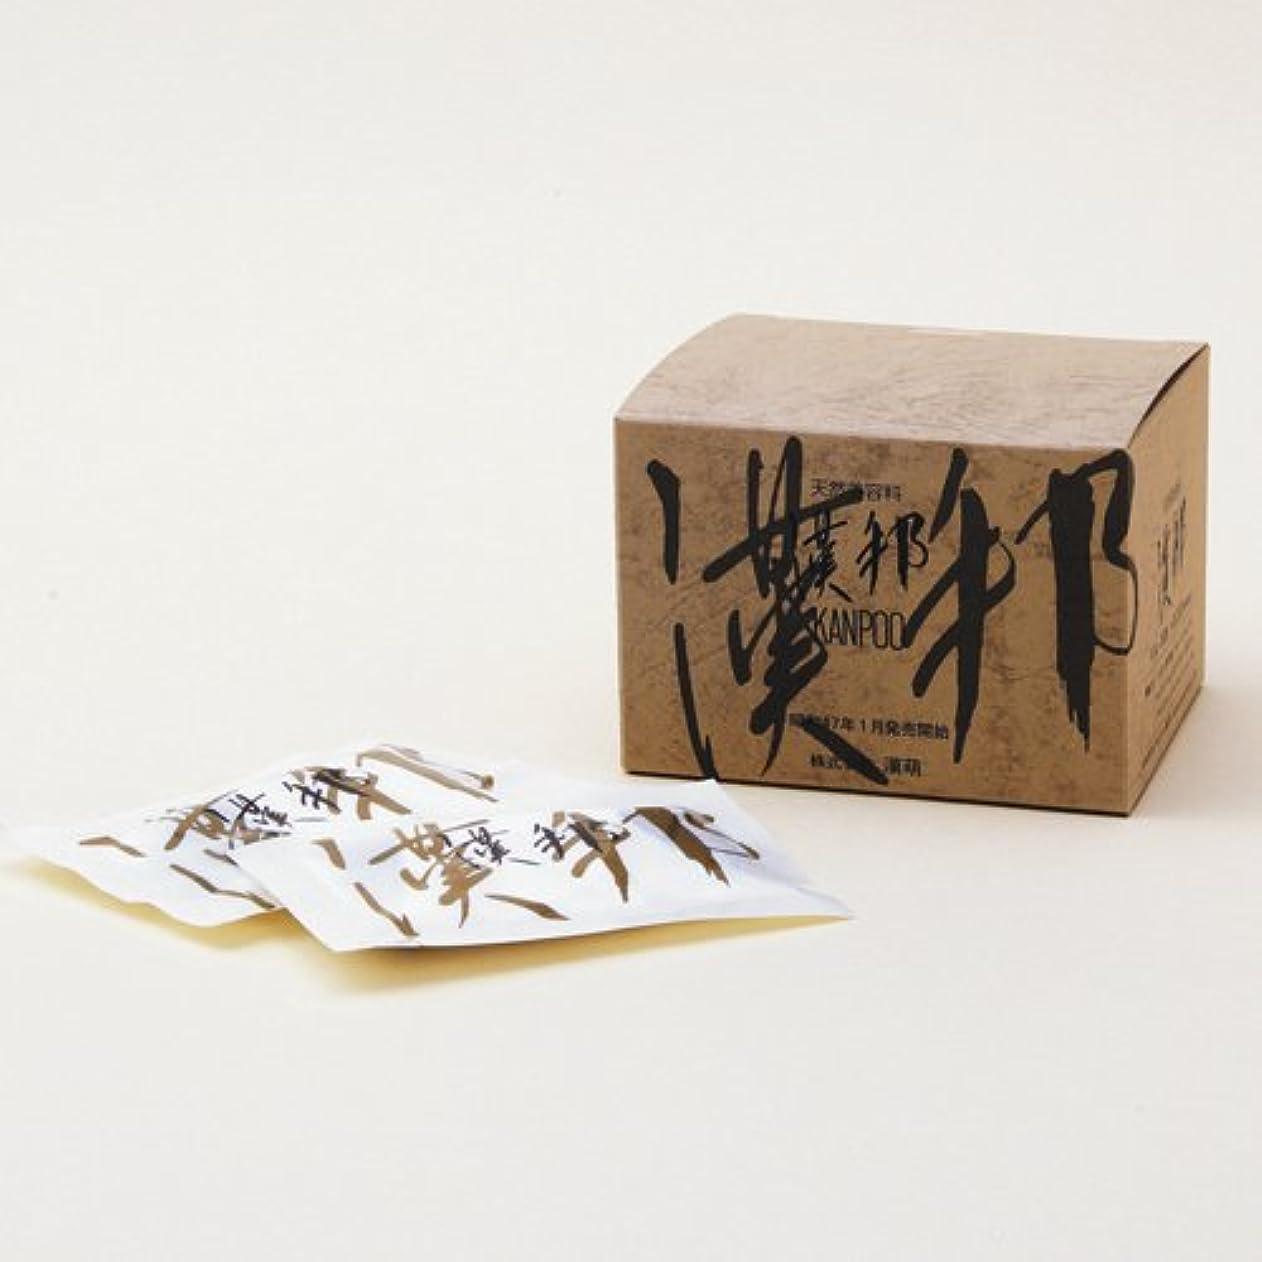 感嘆符生産性バンカー漢萌(KANPOO) 漢邦ぬか袋(全肌活肌料) 熟成12年 10g×16袋